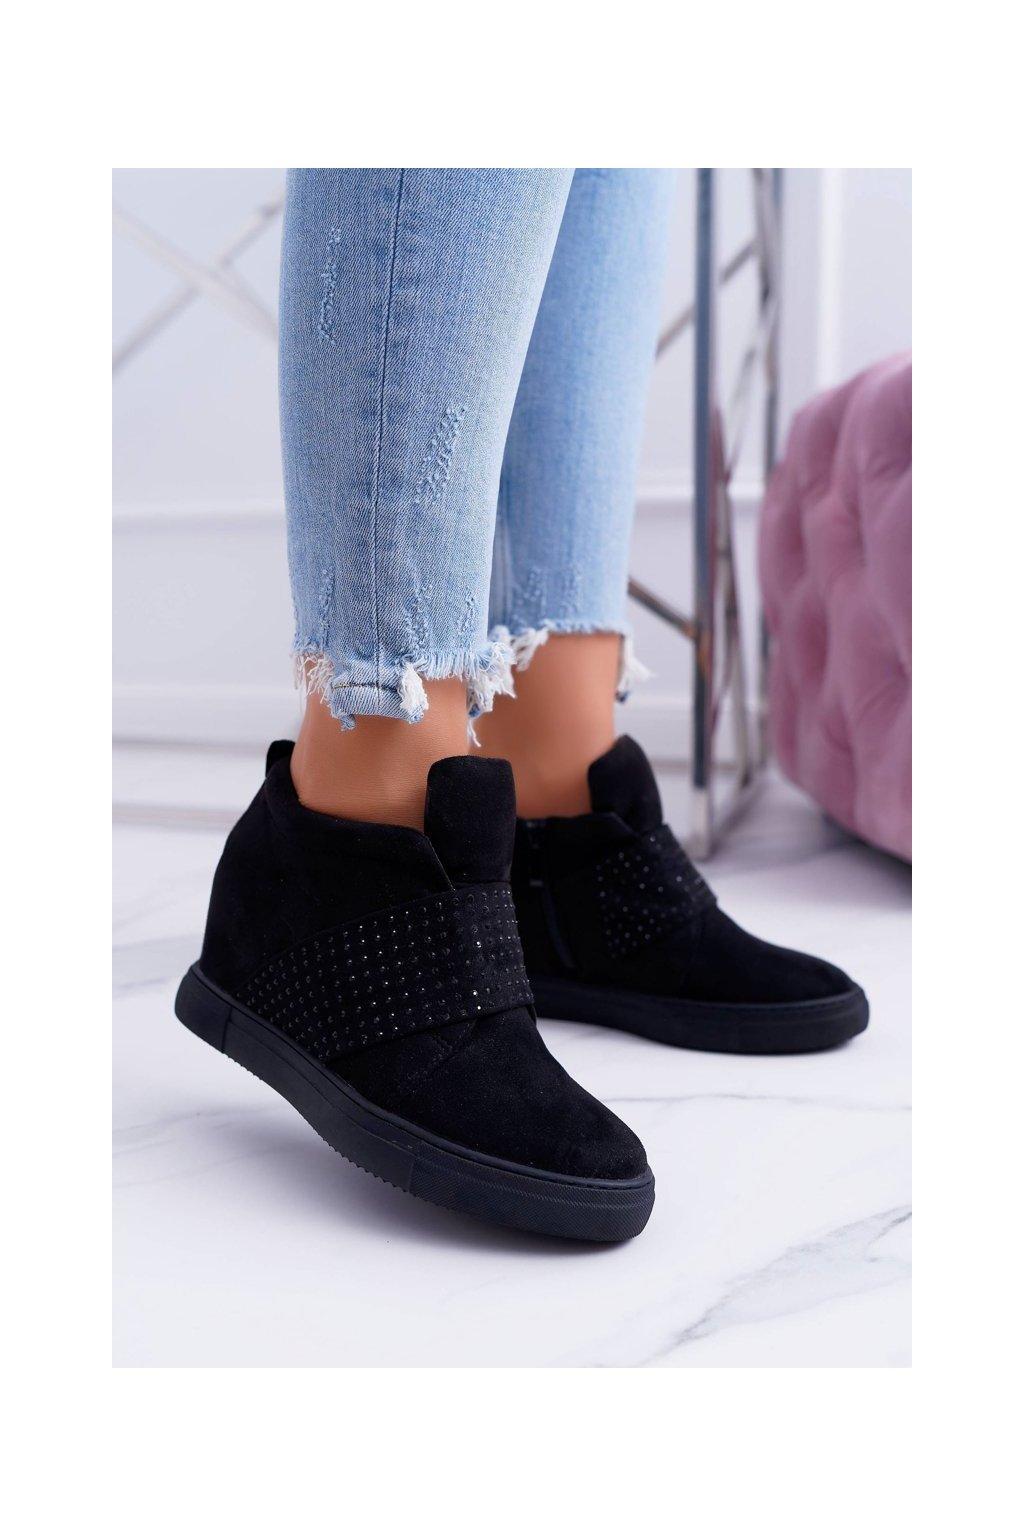 Dámska obuv sneakery na kline Lu Boo PinkSugar